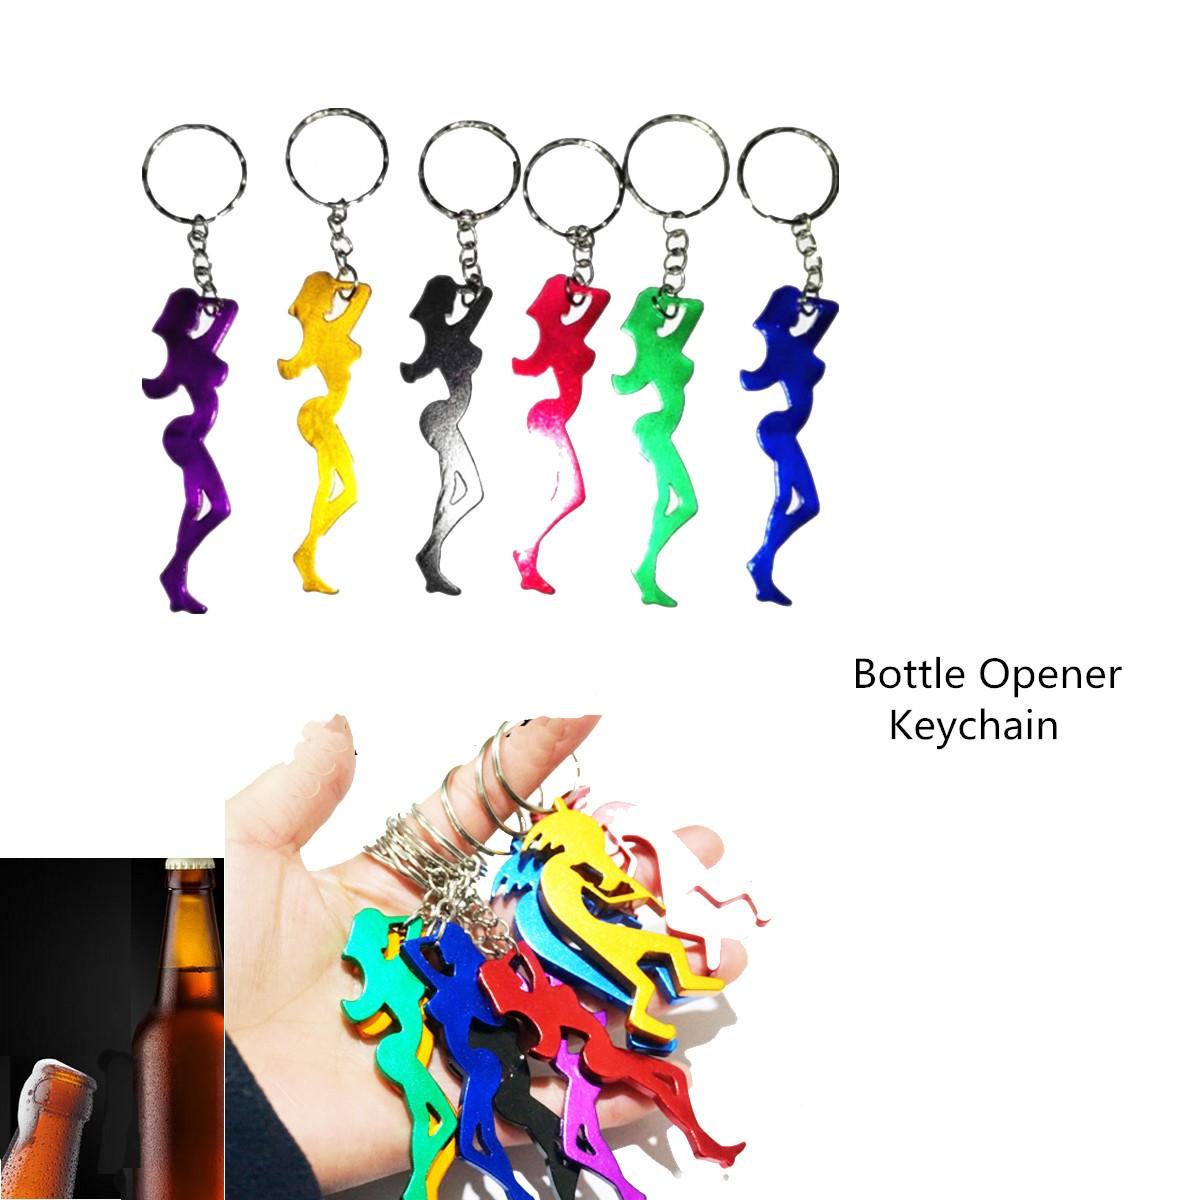 sexy beauty girl bottle opener key ring keychain alex nld. Black Bedroom Furniture Sets. Home Design Ideas